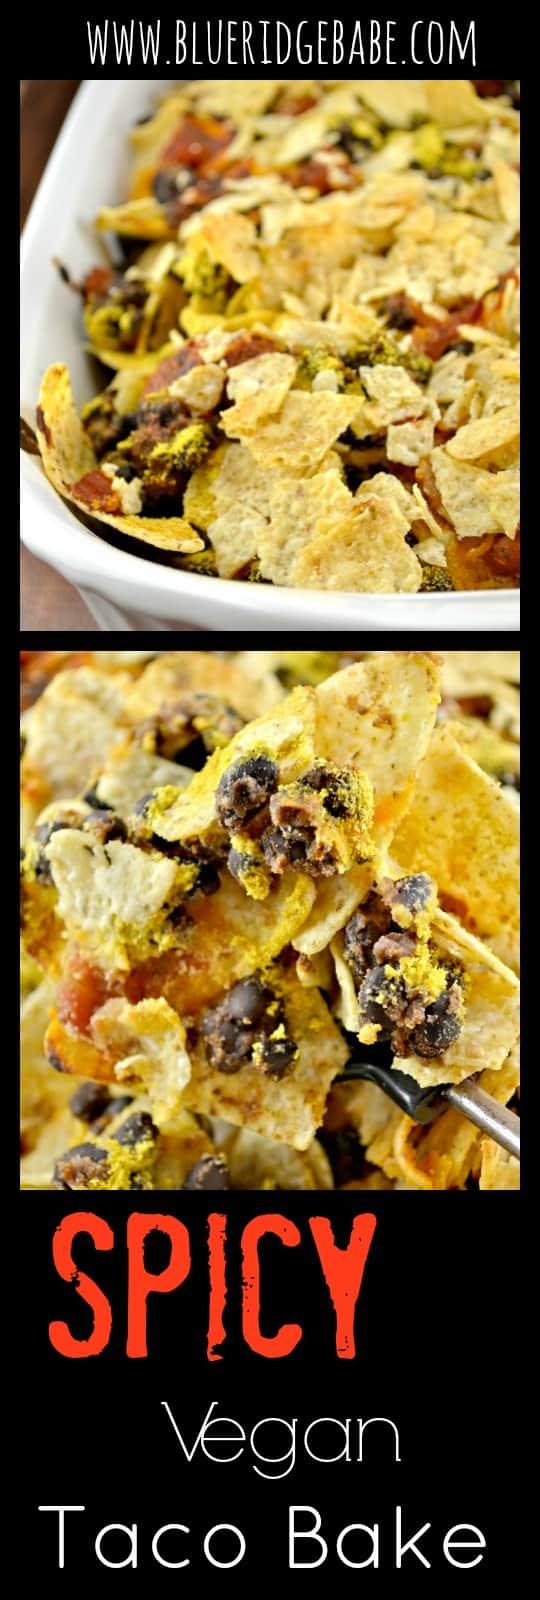 spicy vegan taco bake recipe